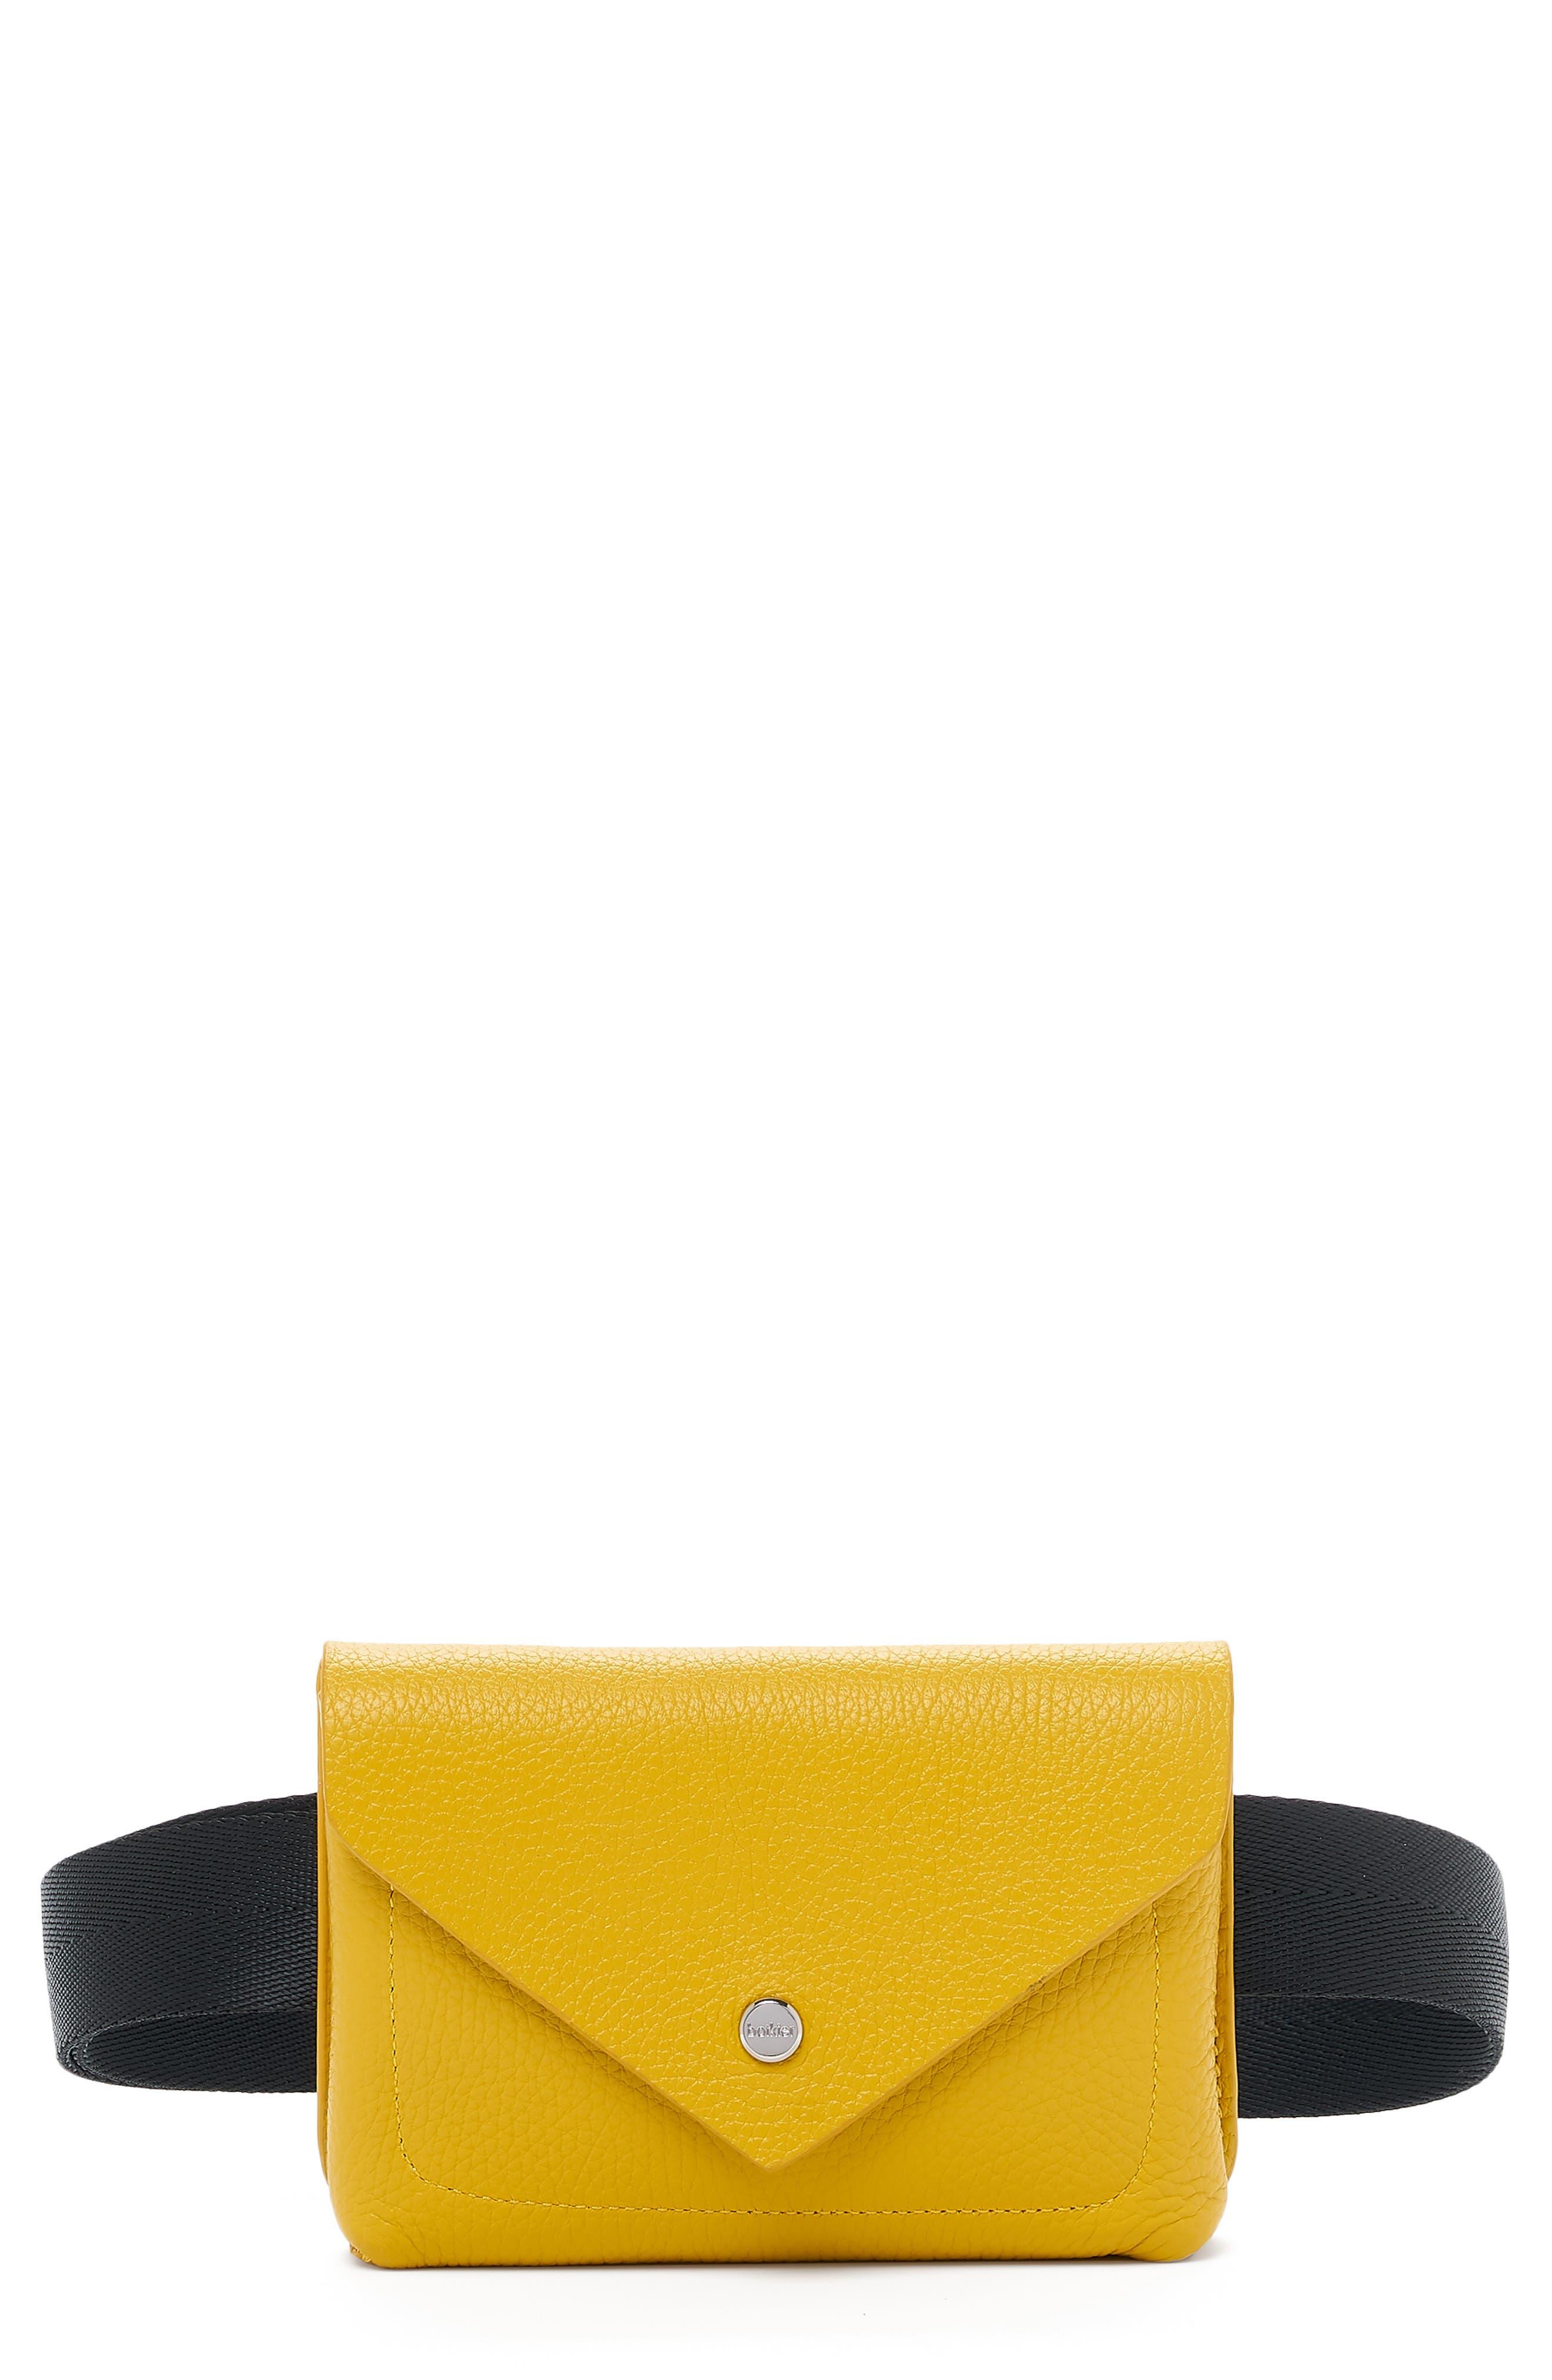 Vivi Calfskin Leather Belt Bag - Yellow in Marigold